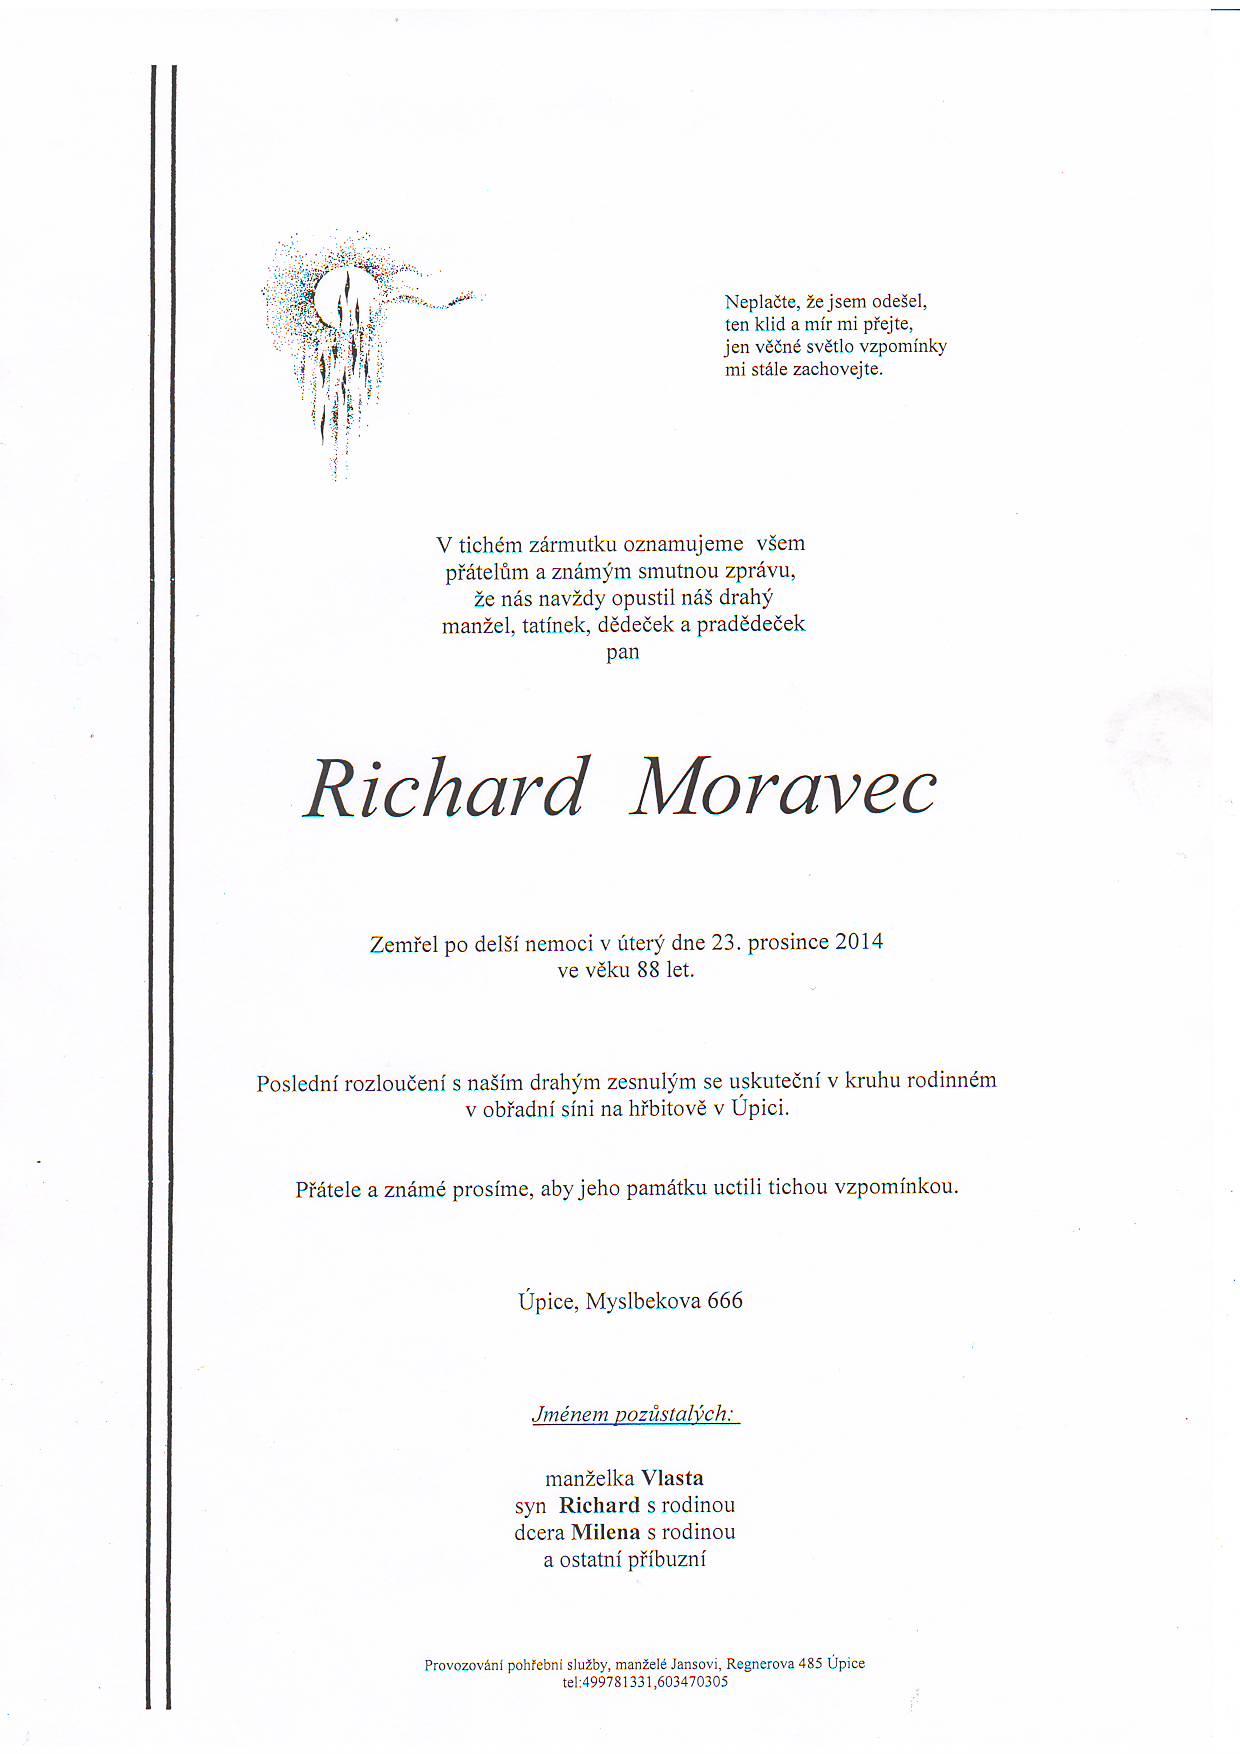 21_moravec_richard